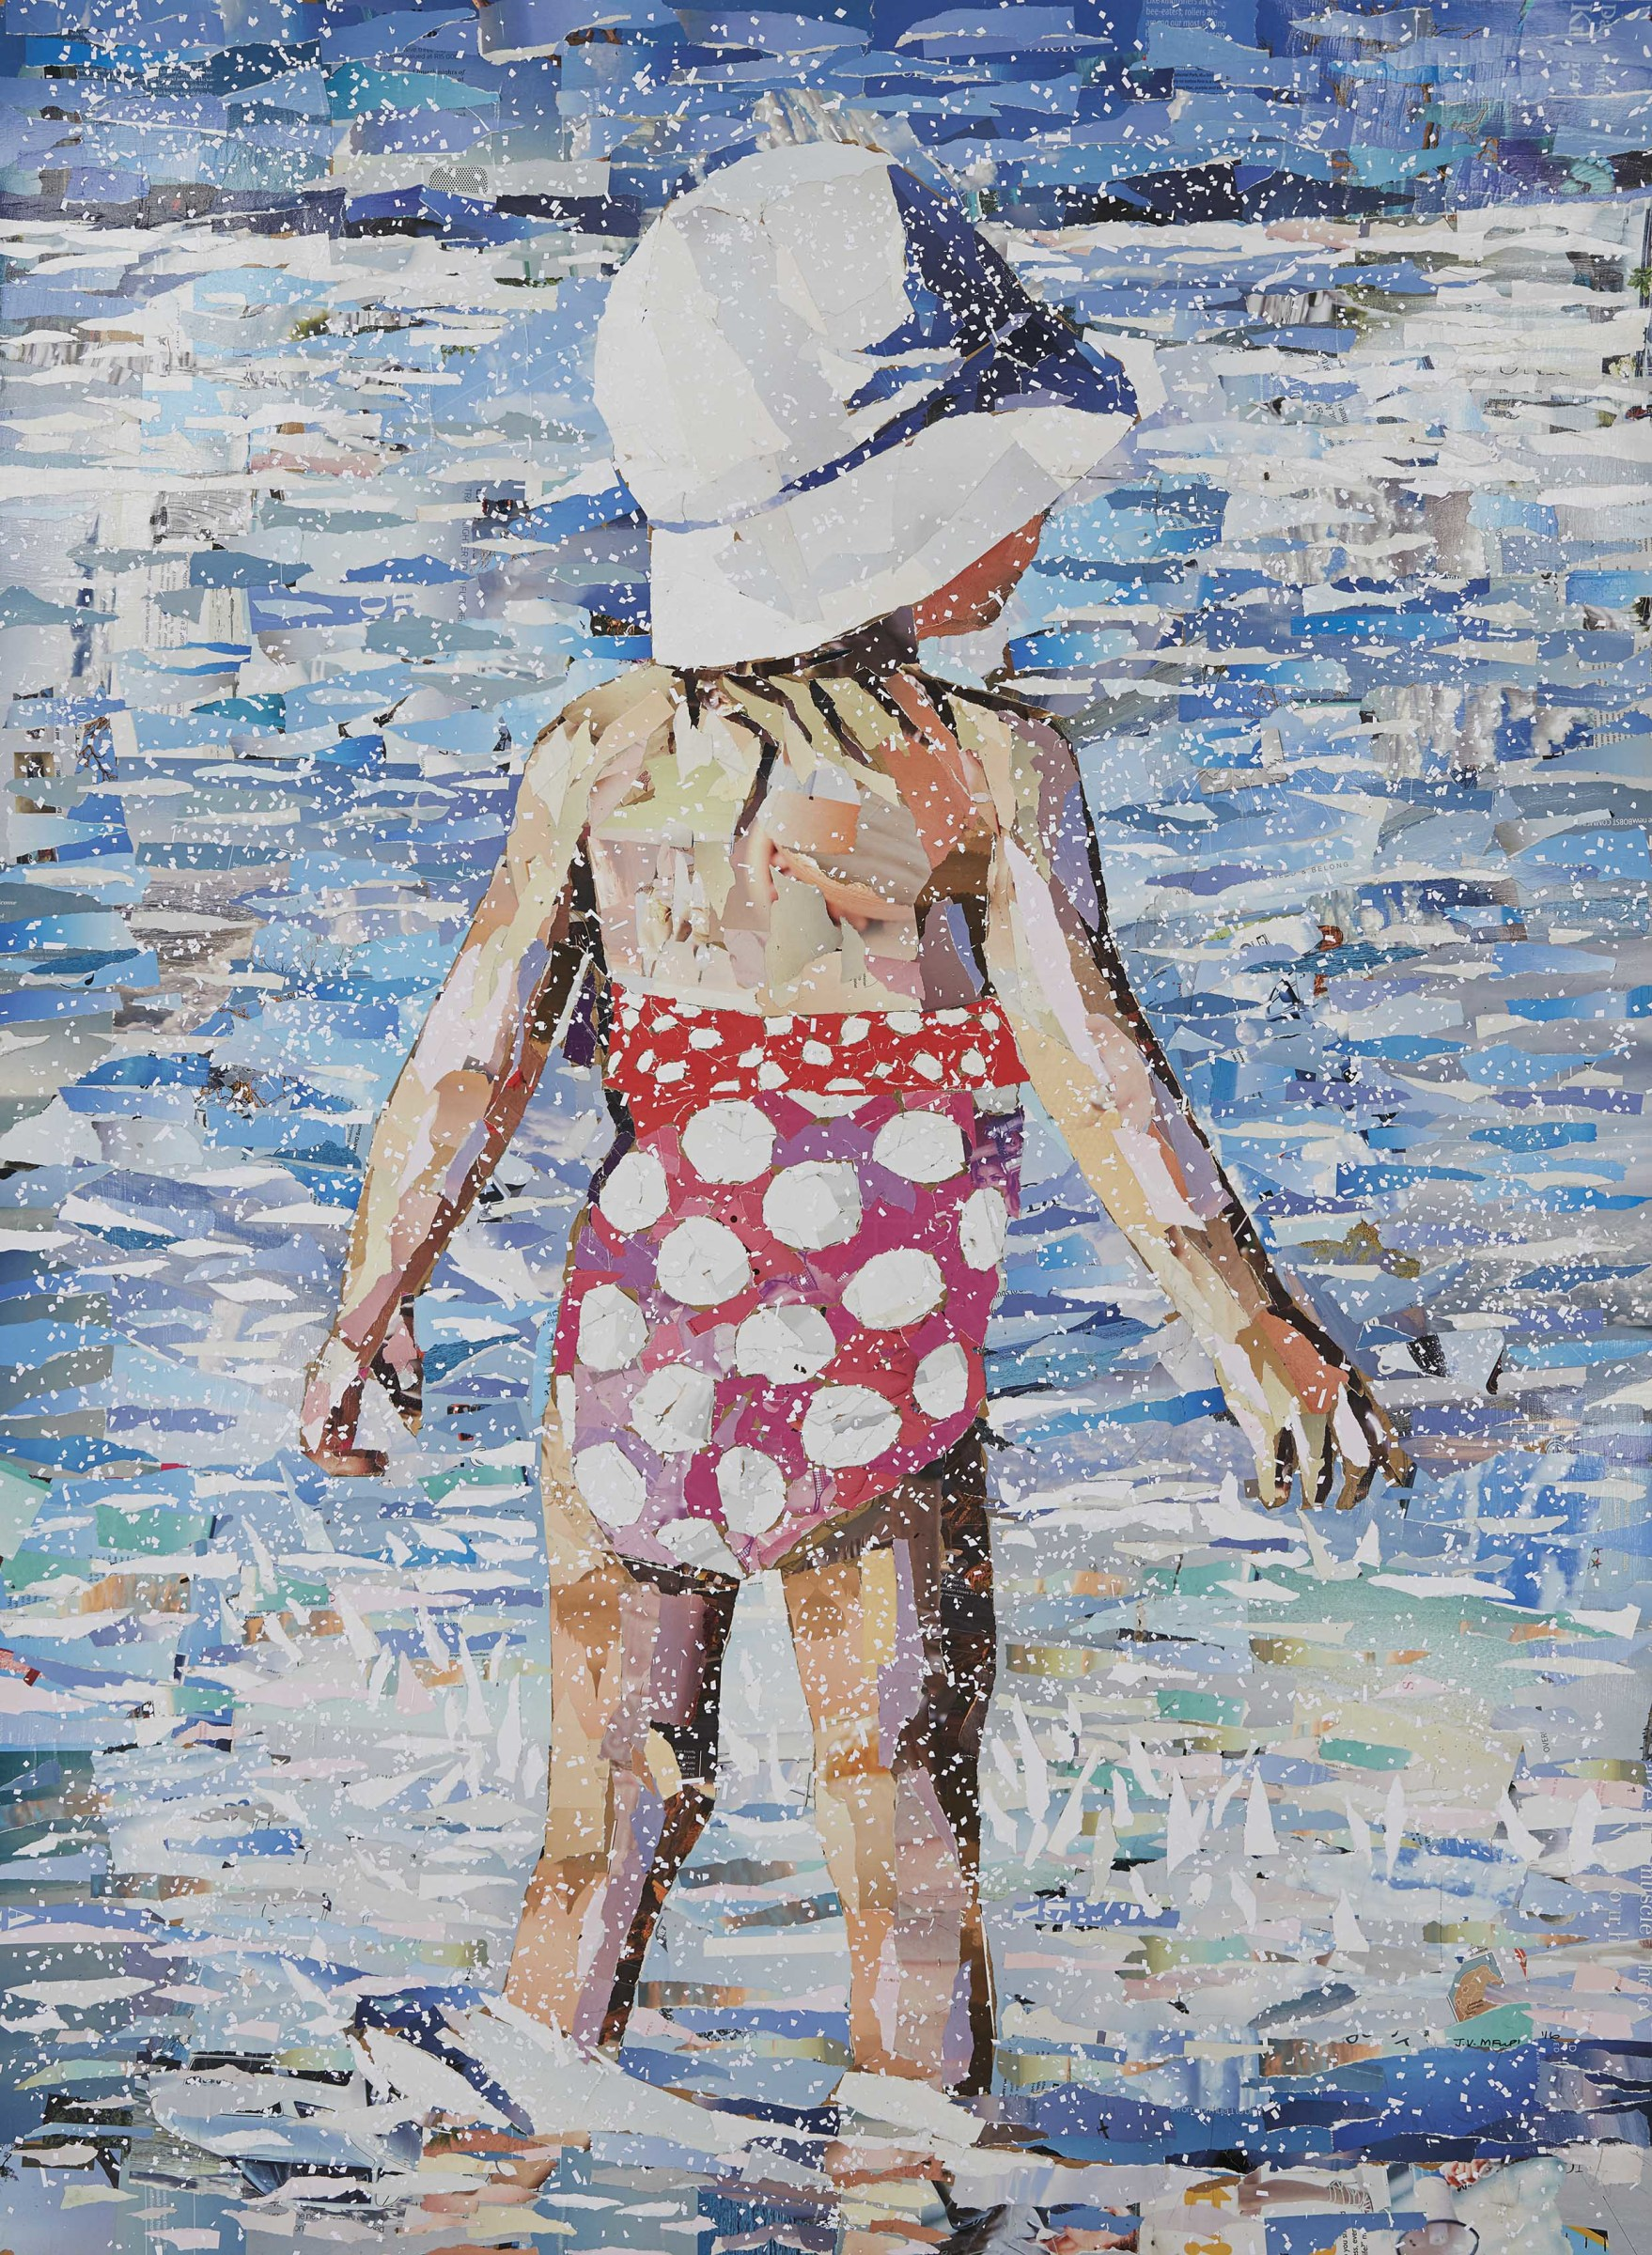 "<span class=""link fancybox-details-link""><a href=""/exhibitions/24/works/artworks2106/"">View Detail Page</a></span><div class=""artist""><strong>John Vusi Mfupi</strong></div> 1977-<div class=""title""><em>Snow At The Beach</em>, 2016</div><div class=""medium"">Magazine collage on paper</div><div class=""dimensions"">1520x1100mm</div>"